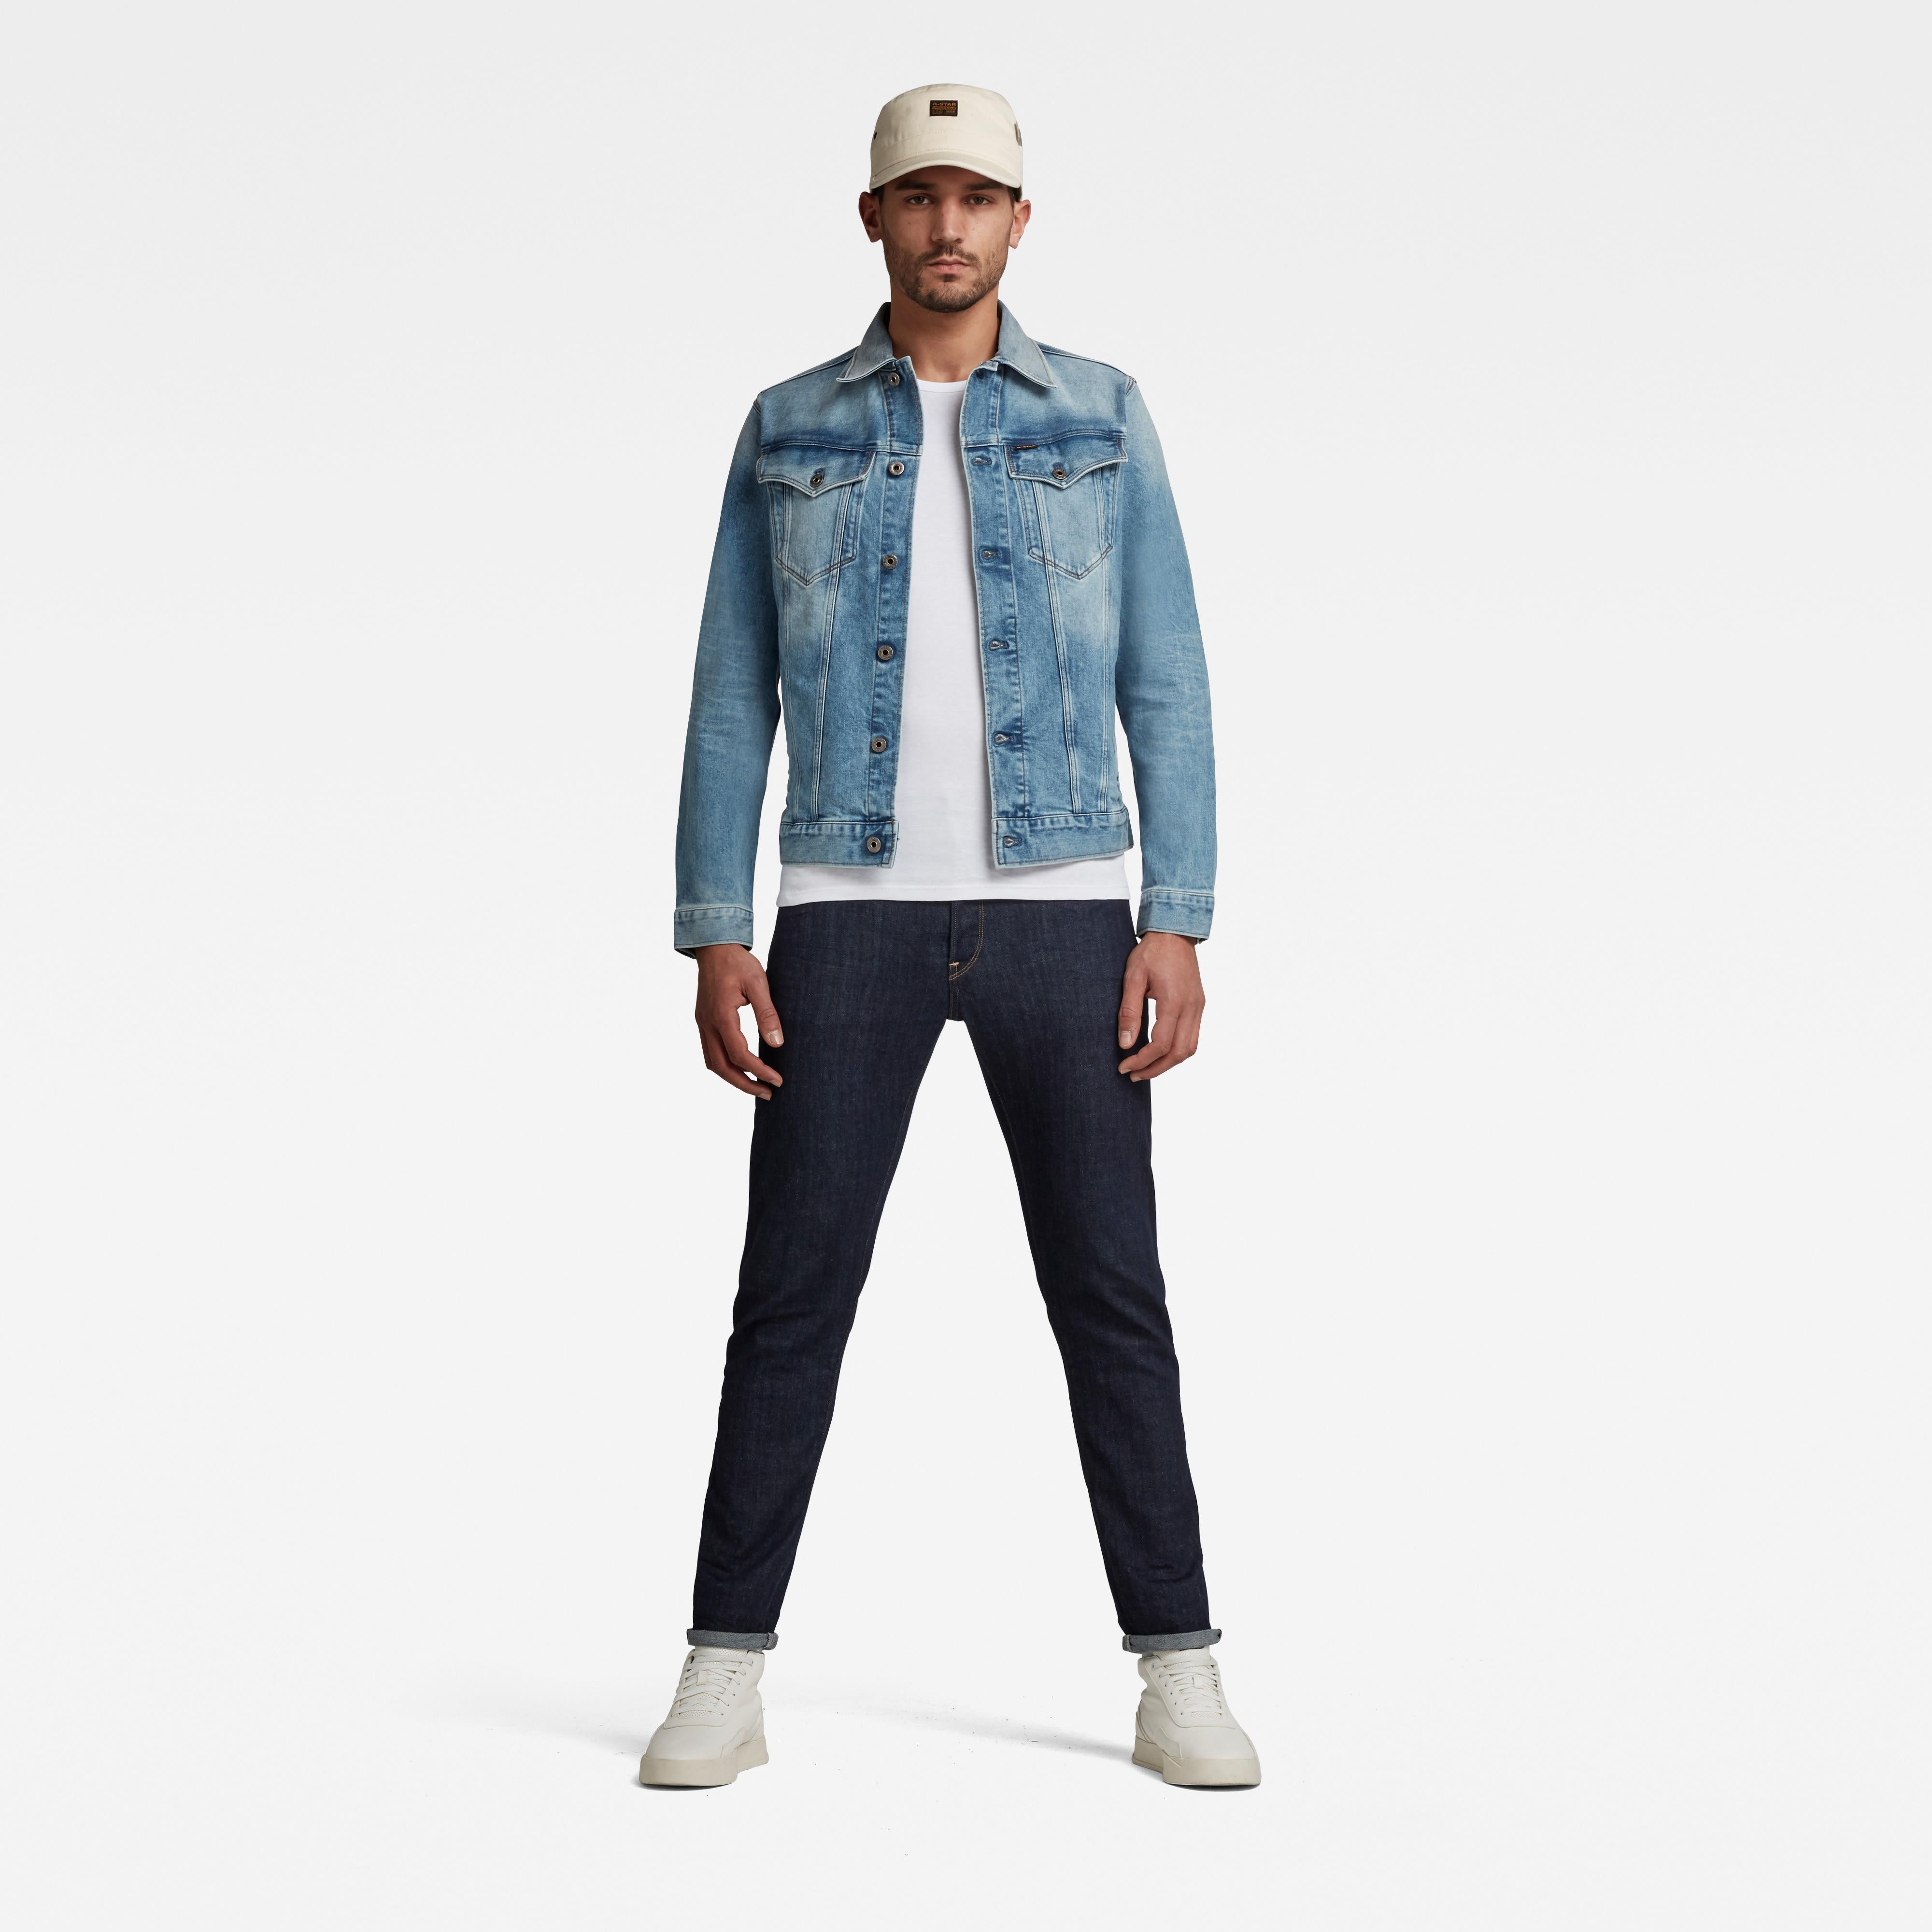 G-Star Raw Herren Jeans Jacke Jeansjacke 3301 SLIM blau unifarben D11150 C052 C293